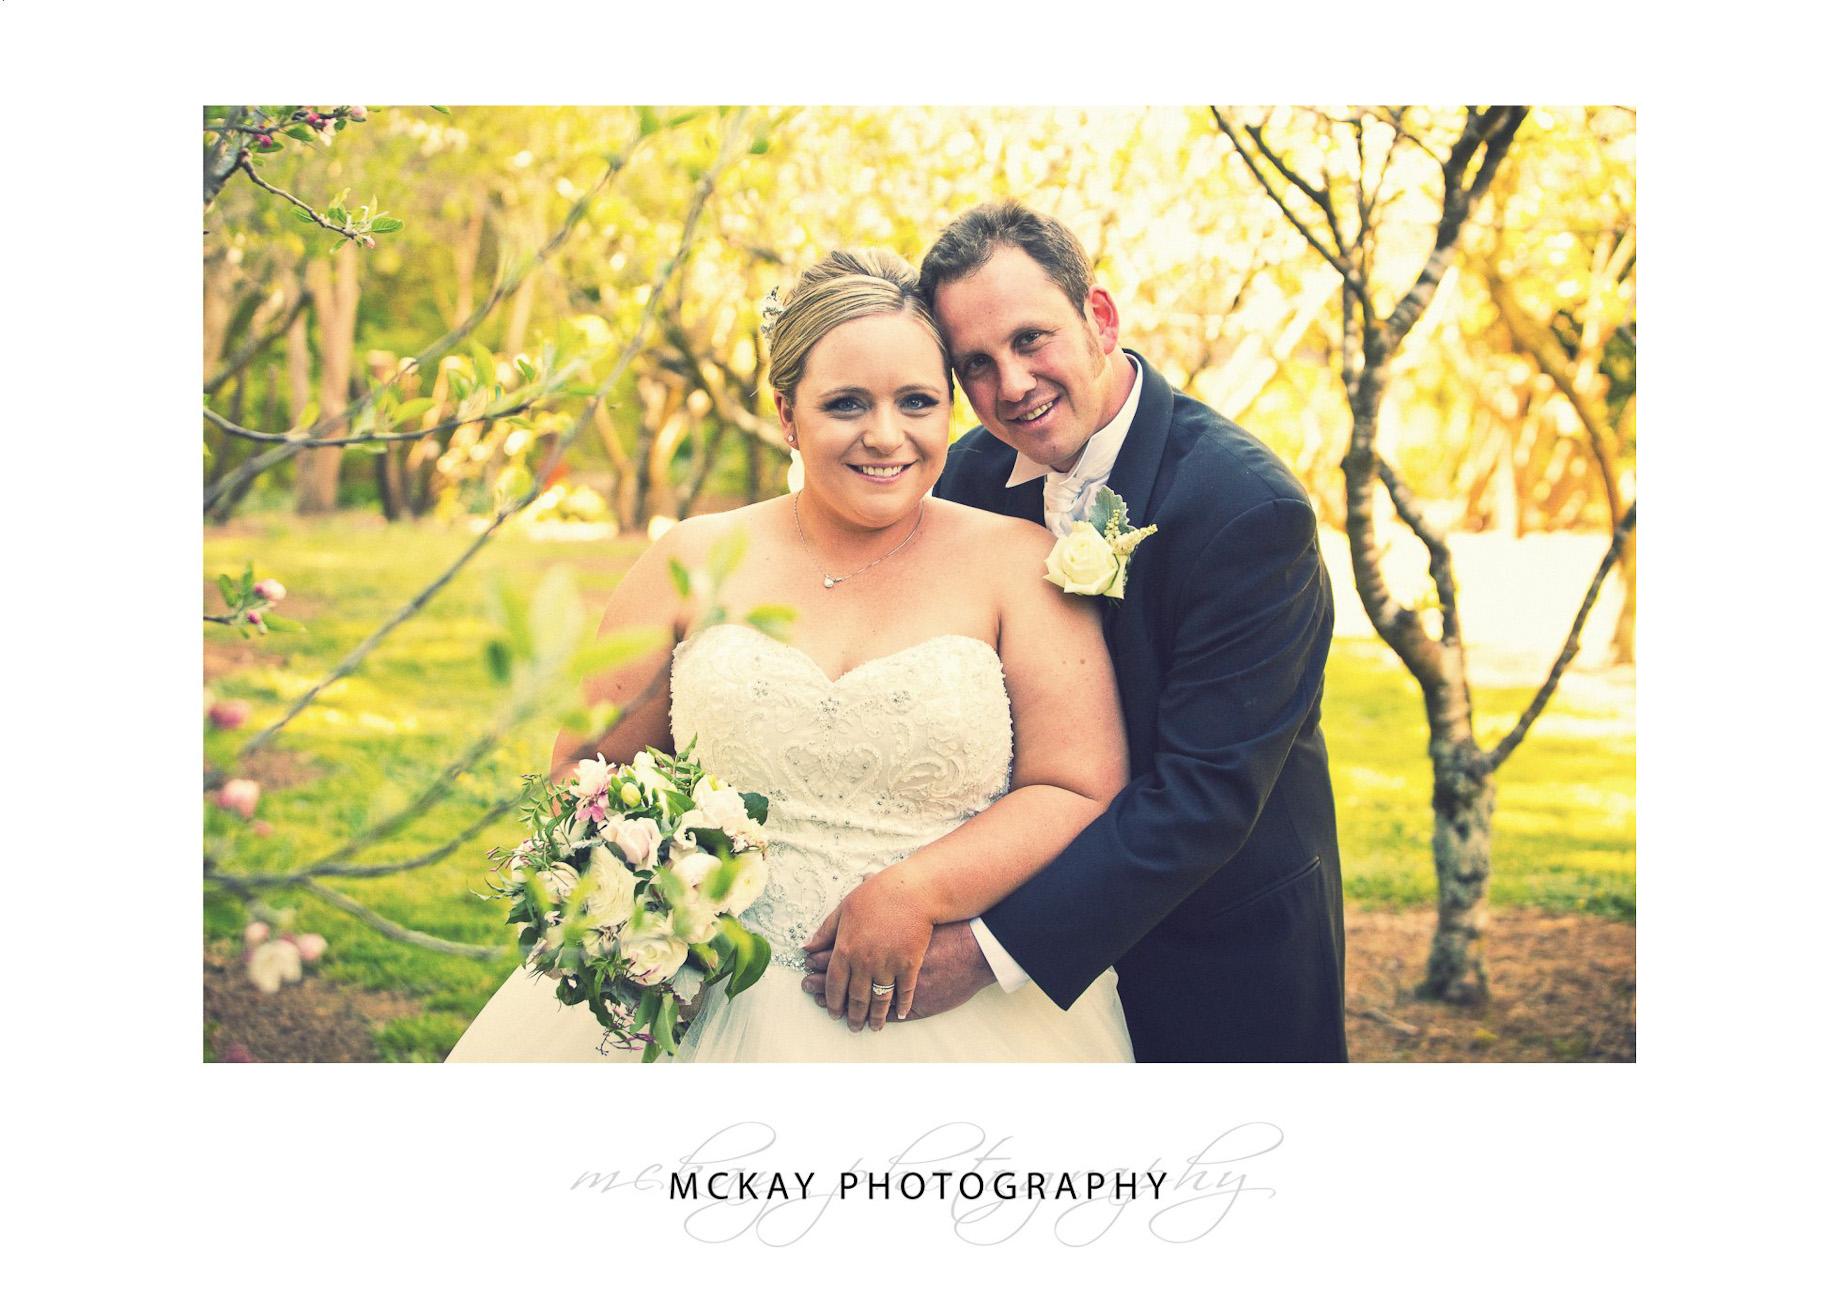 Rebecca & Steve - wedding photo at Red Cow Farm